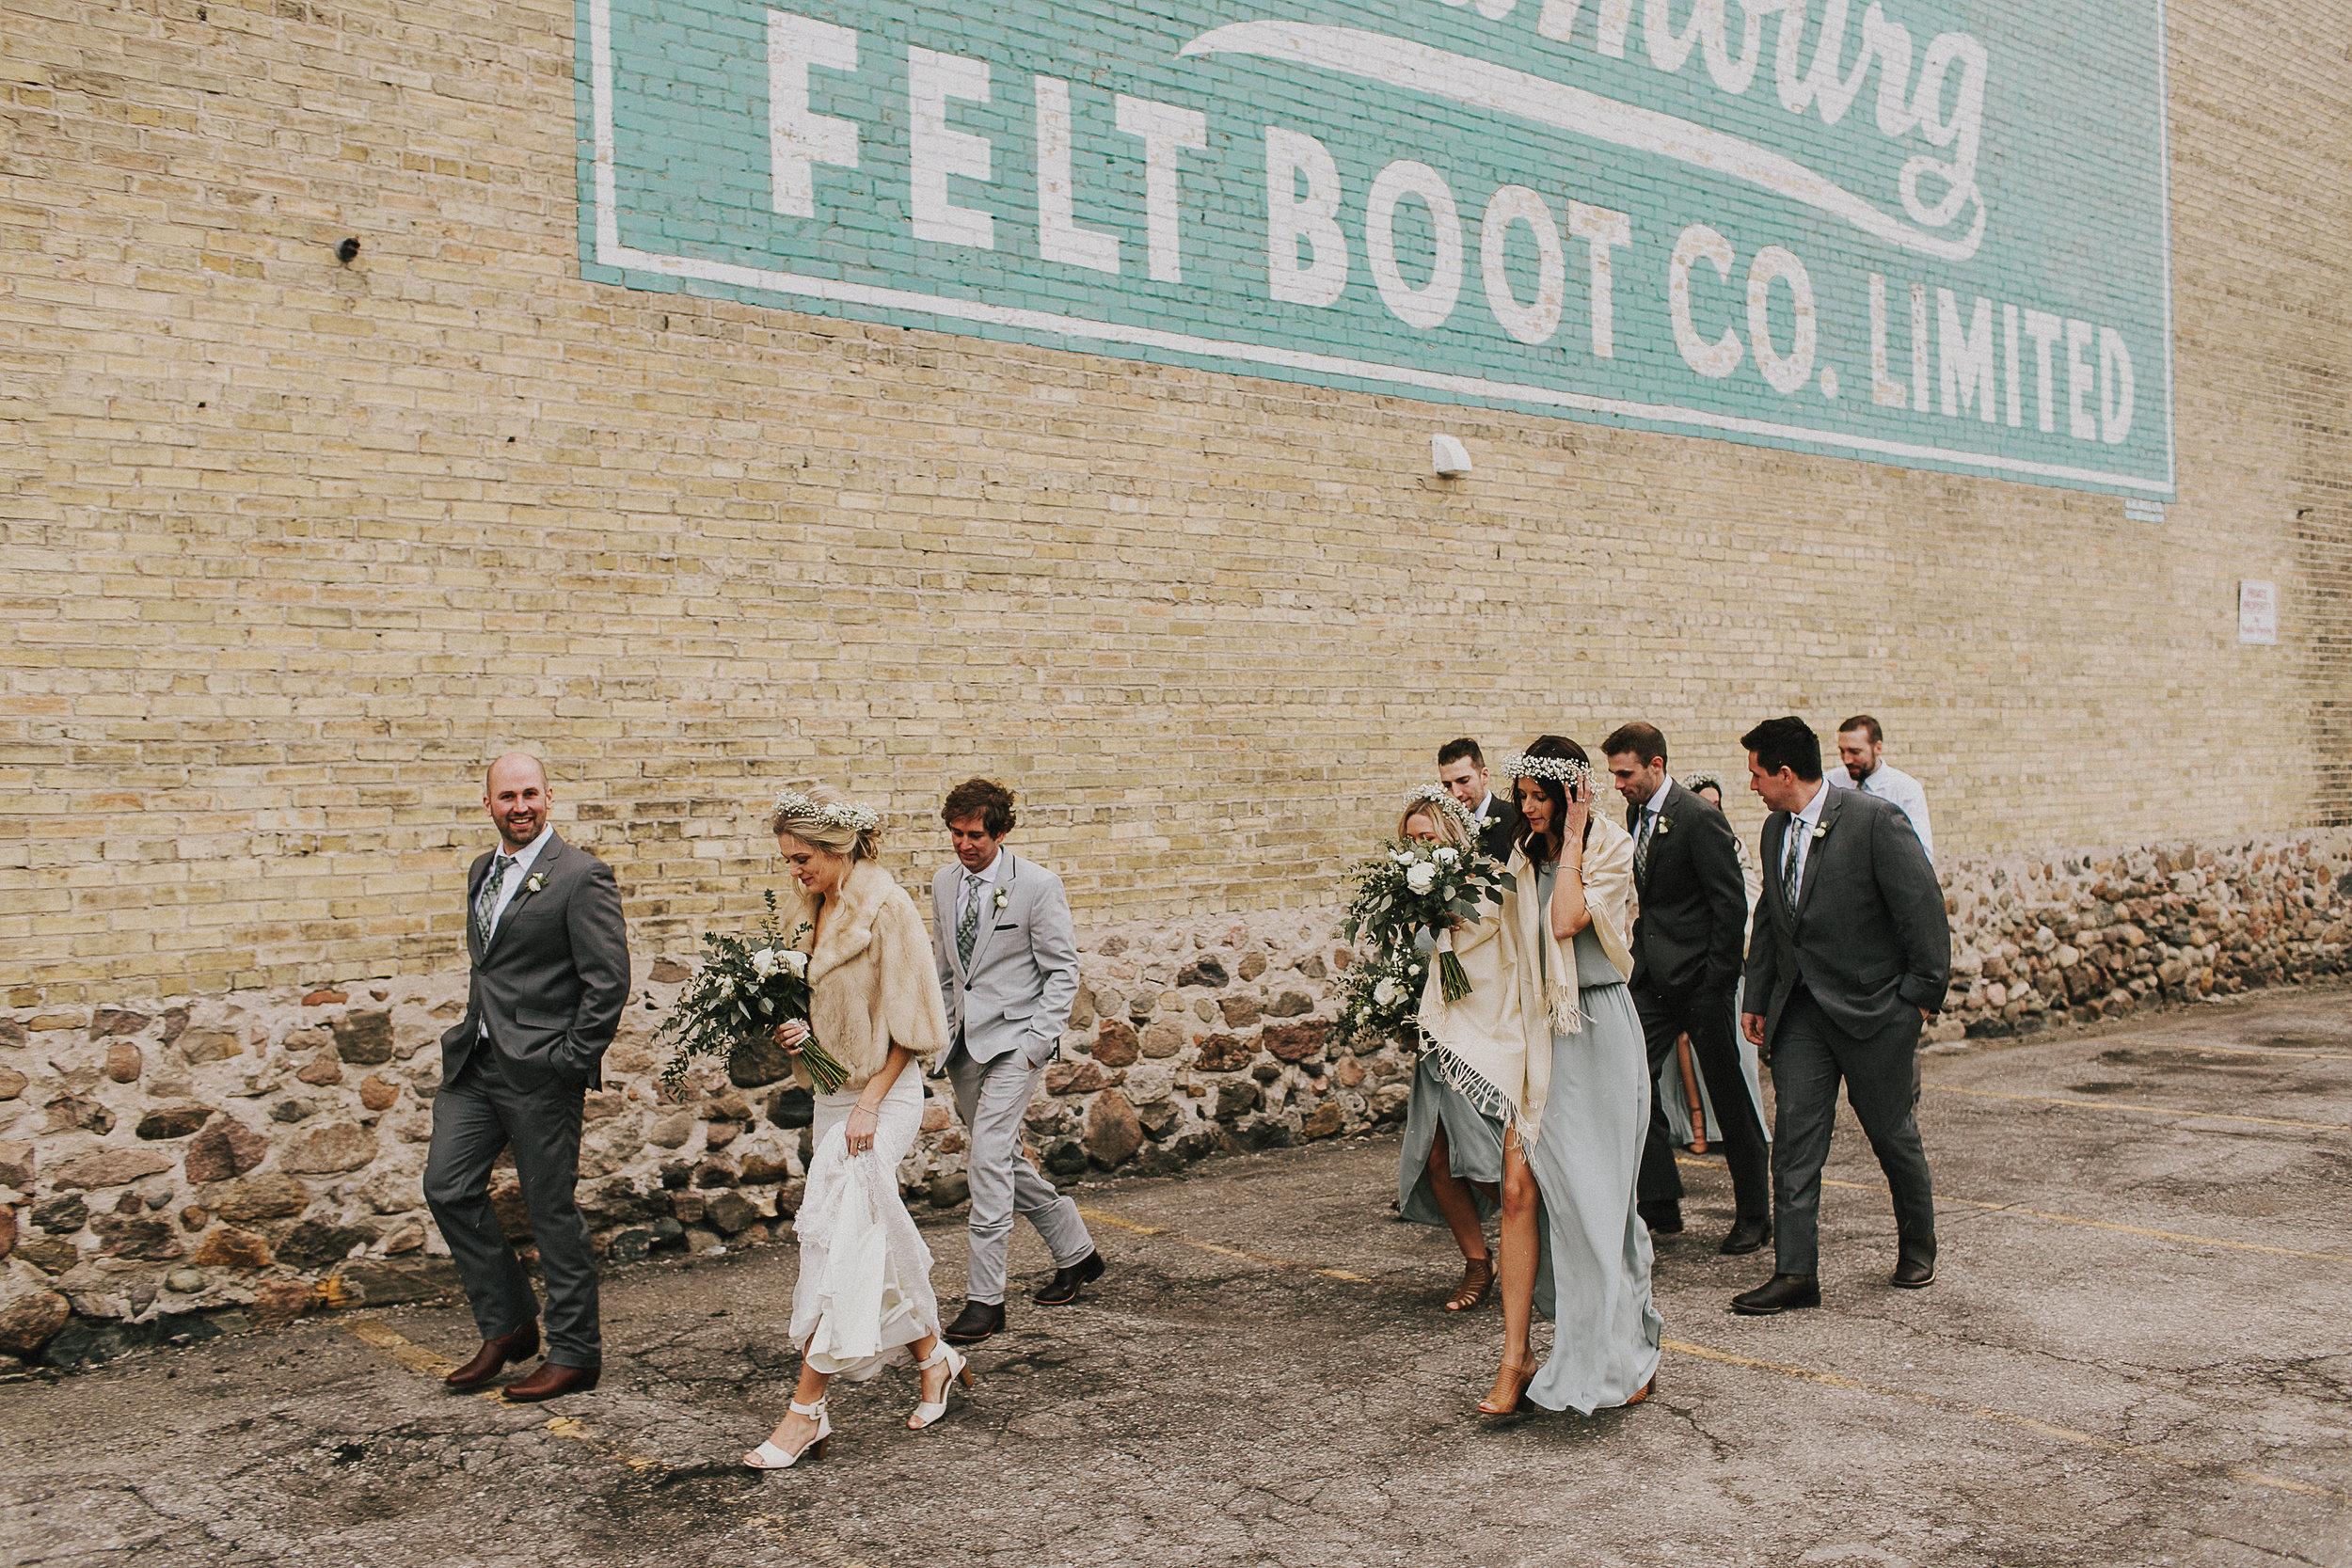 mark-and-liz-wedding-394.jpg